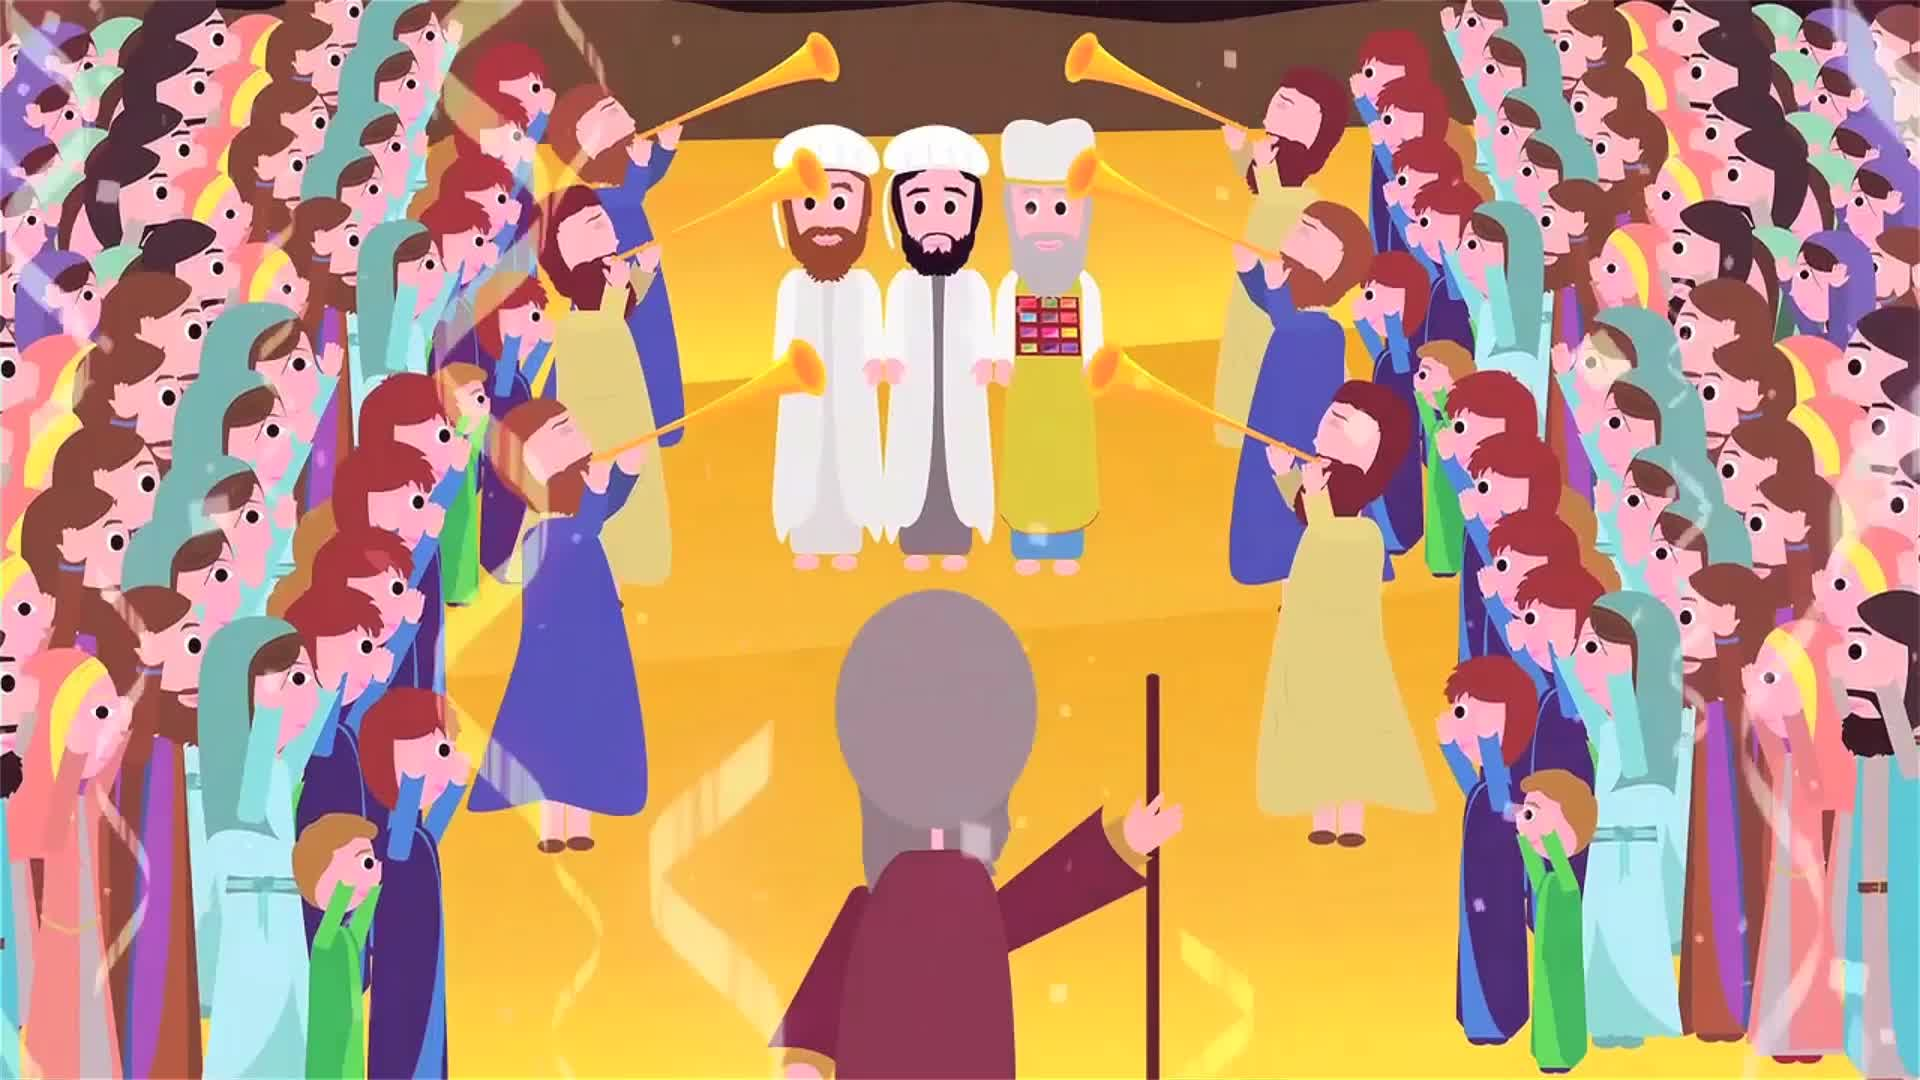 The Parsha Experiment - Bereishit: Is The Torah One Big Story?